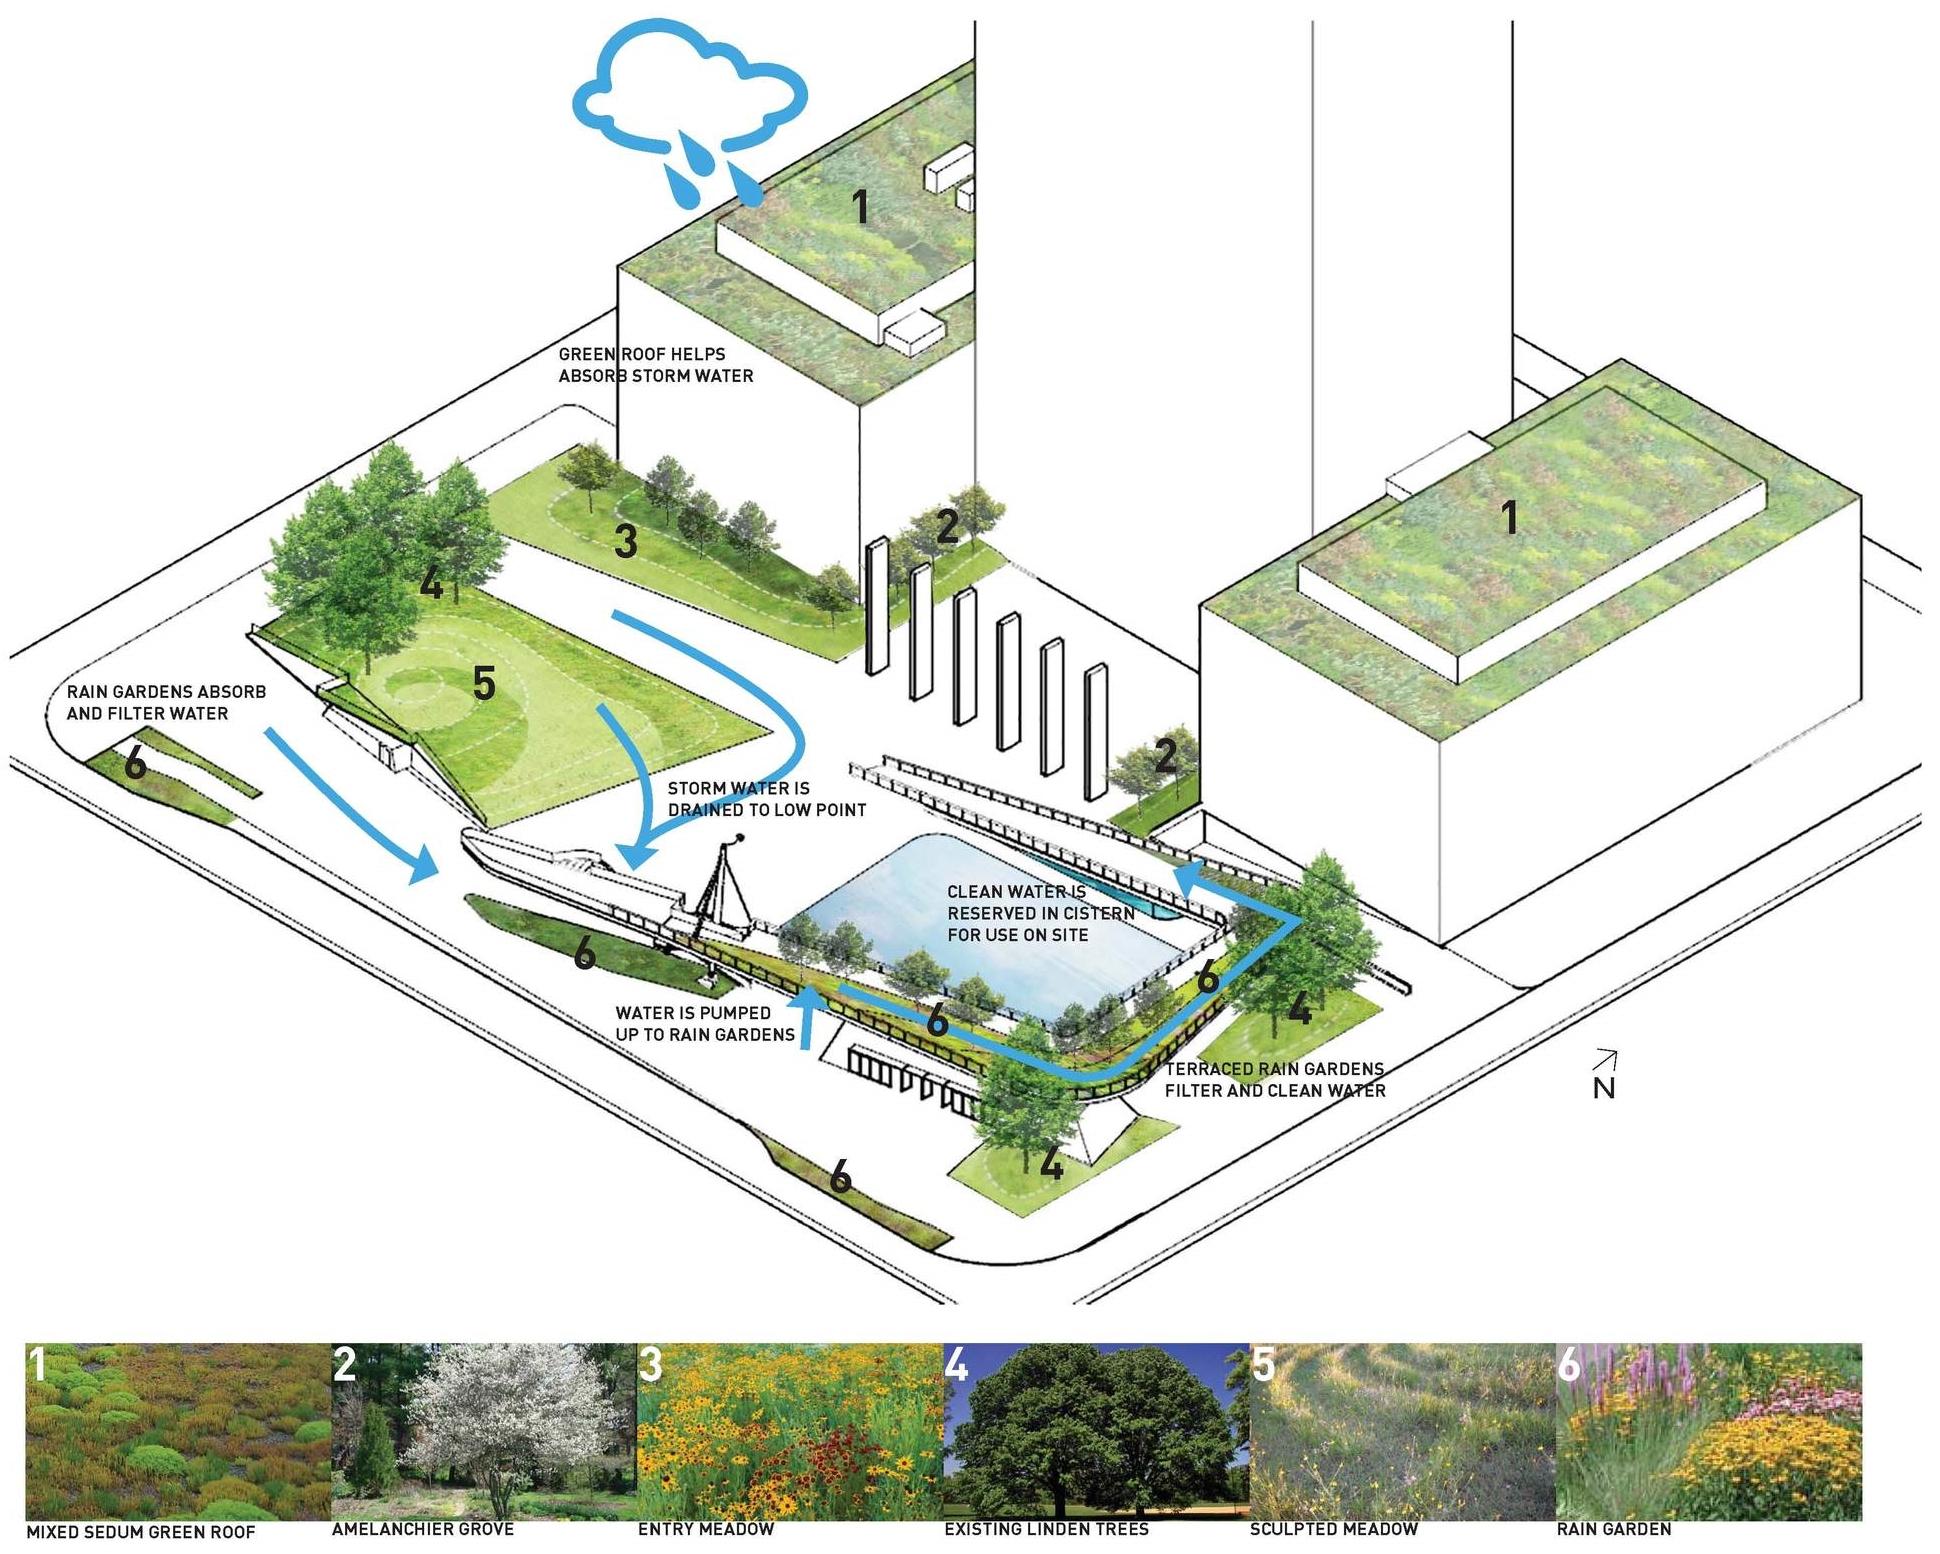 BA_City-County Building Plaza_2014_diagram.jpg